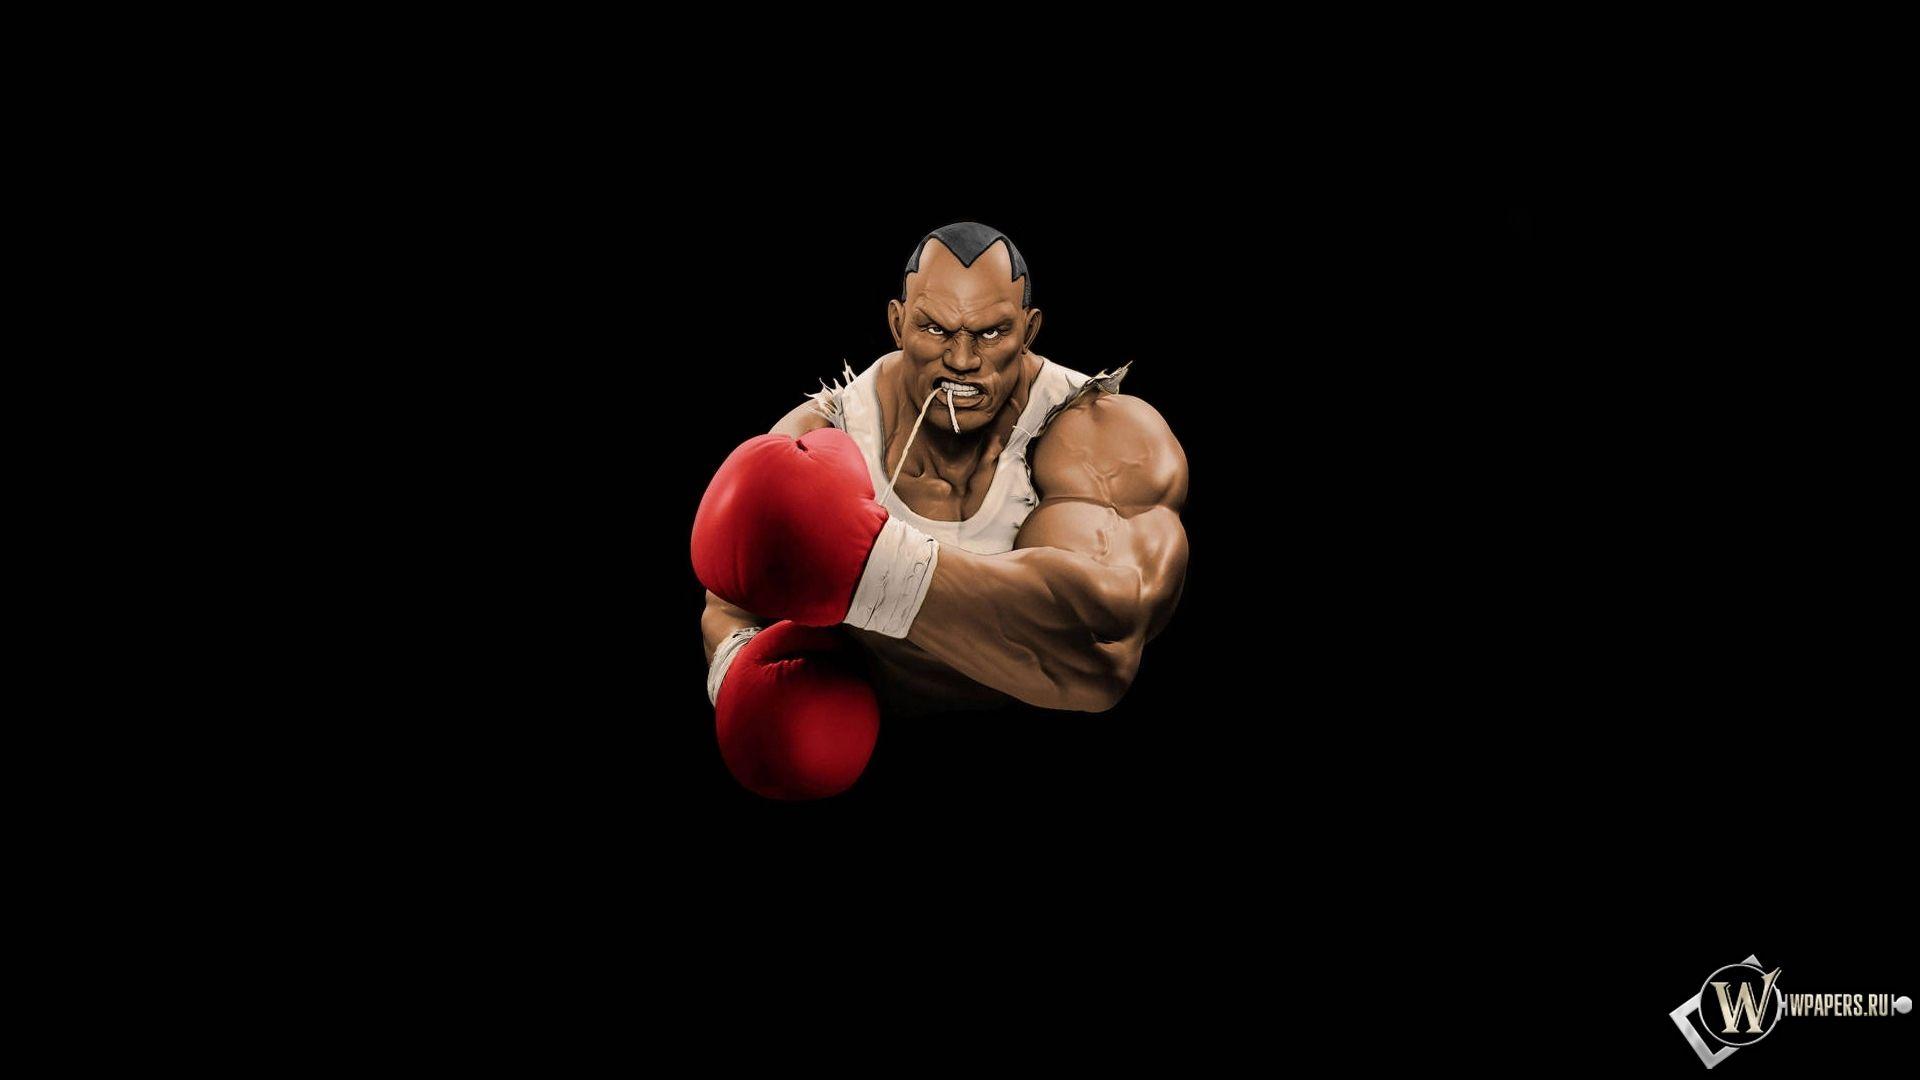 Boxing wallpaper download